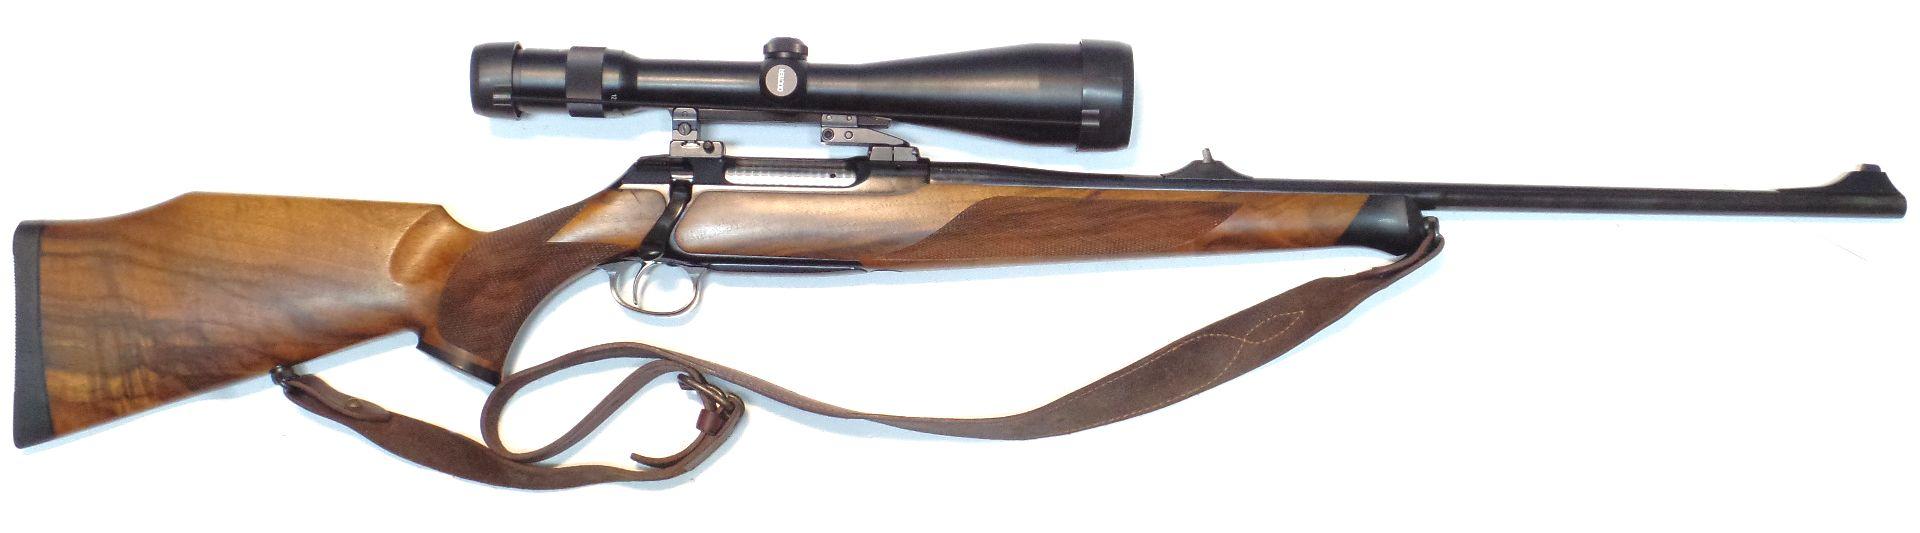 SAUER 202 ELEGANCE calibre .243 Winchester